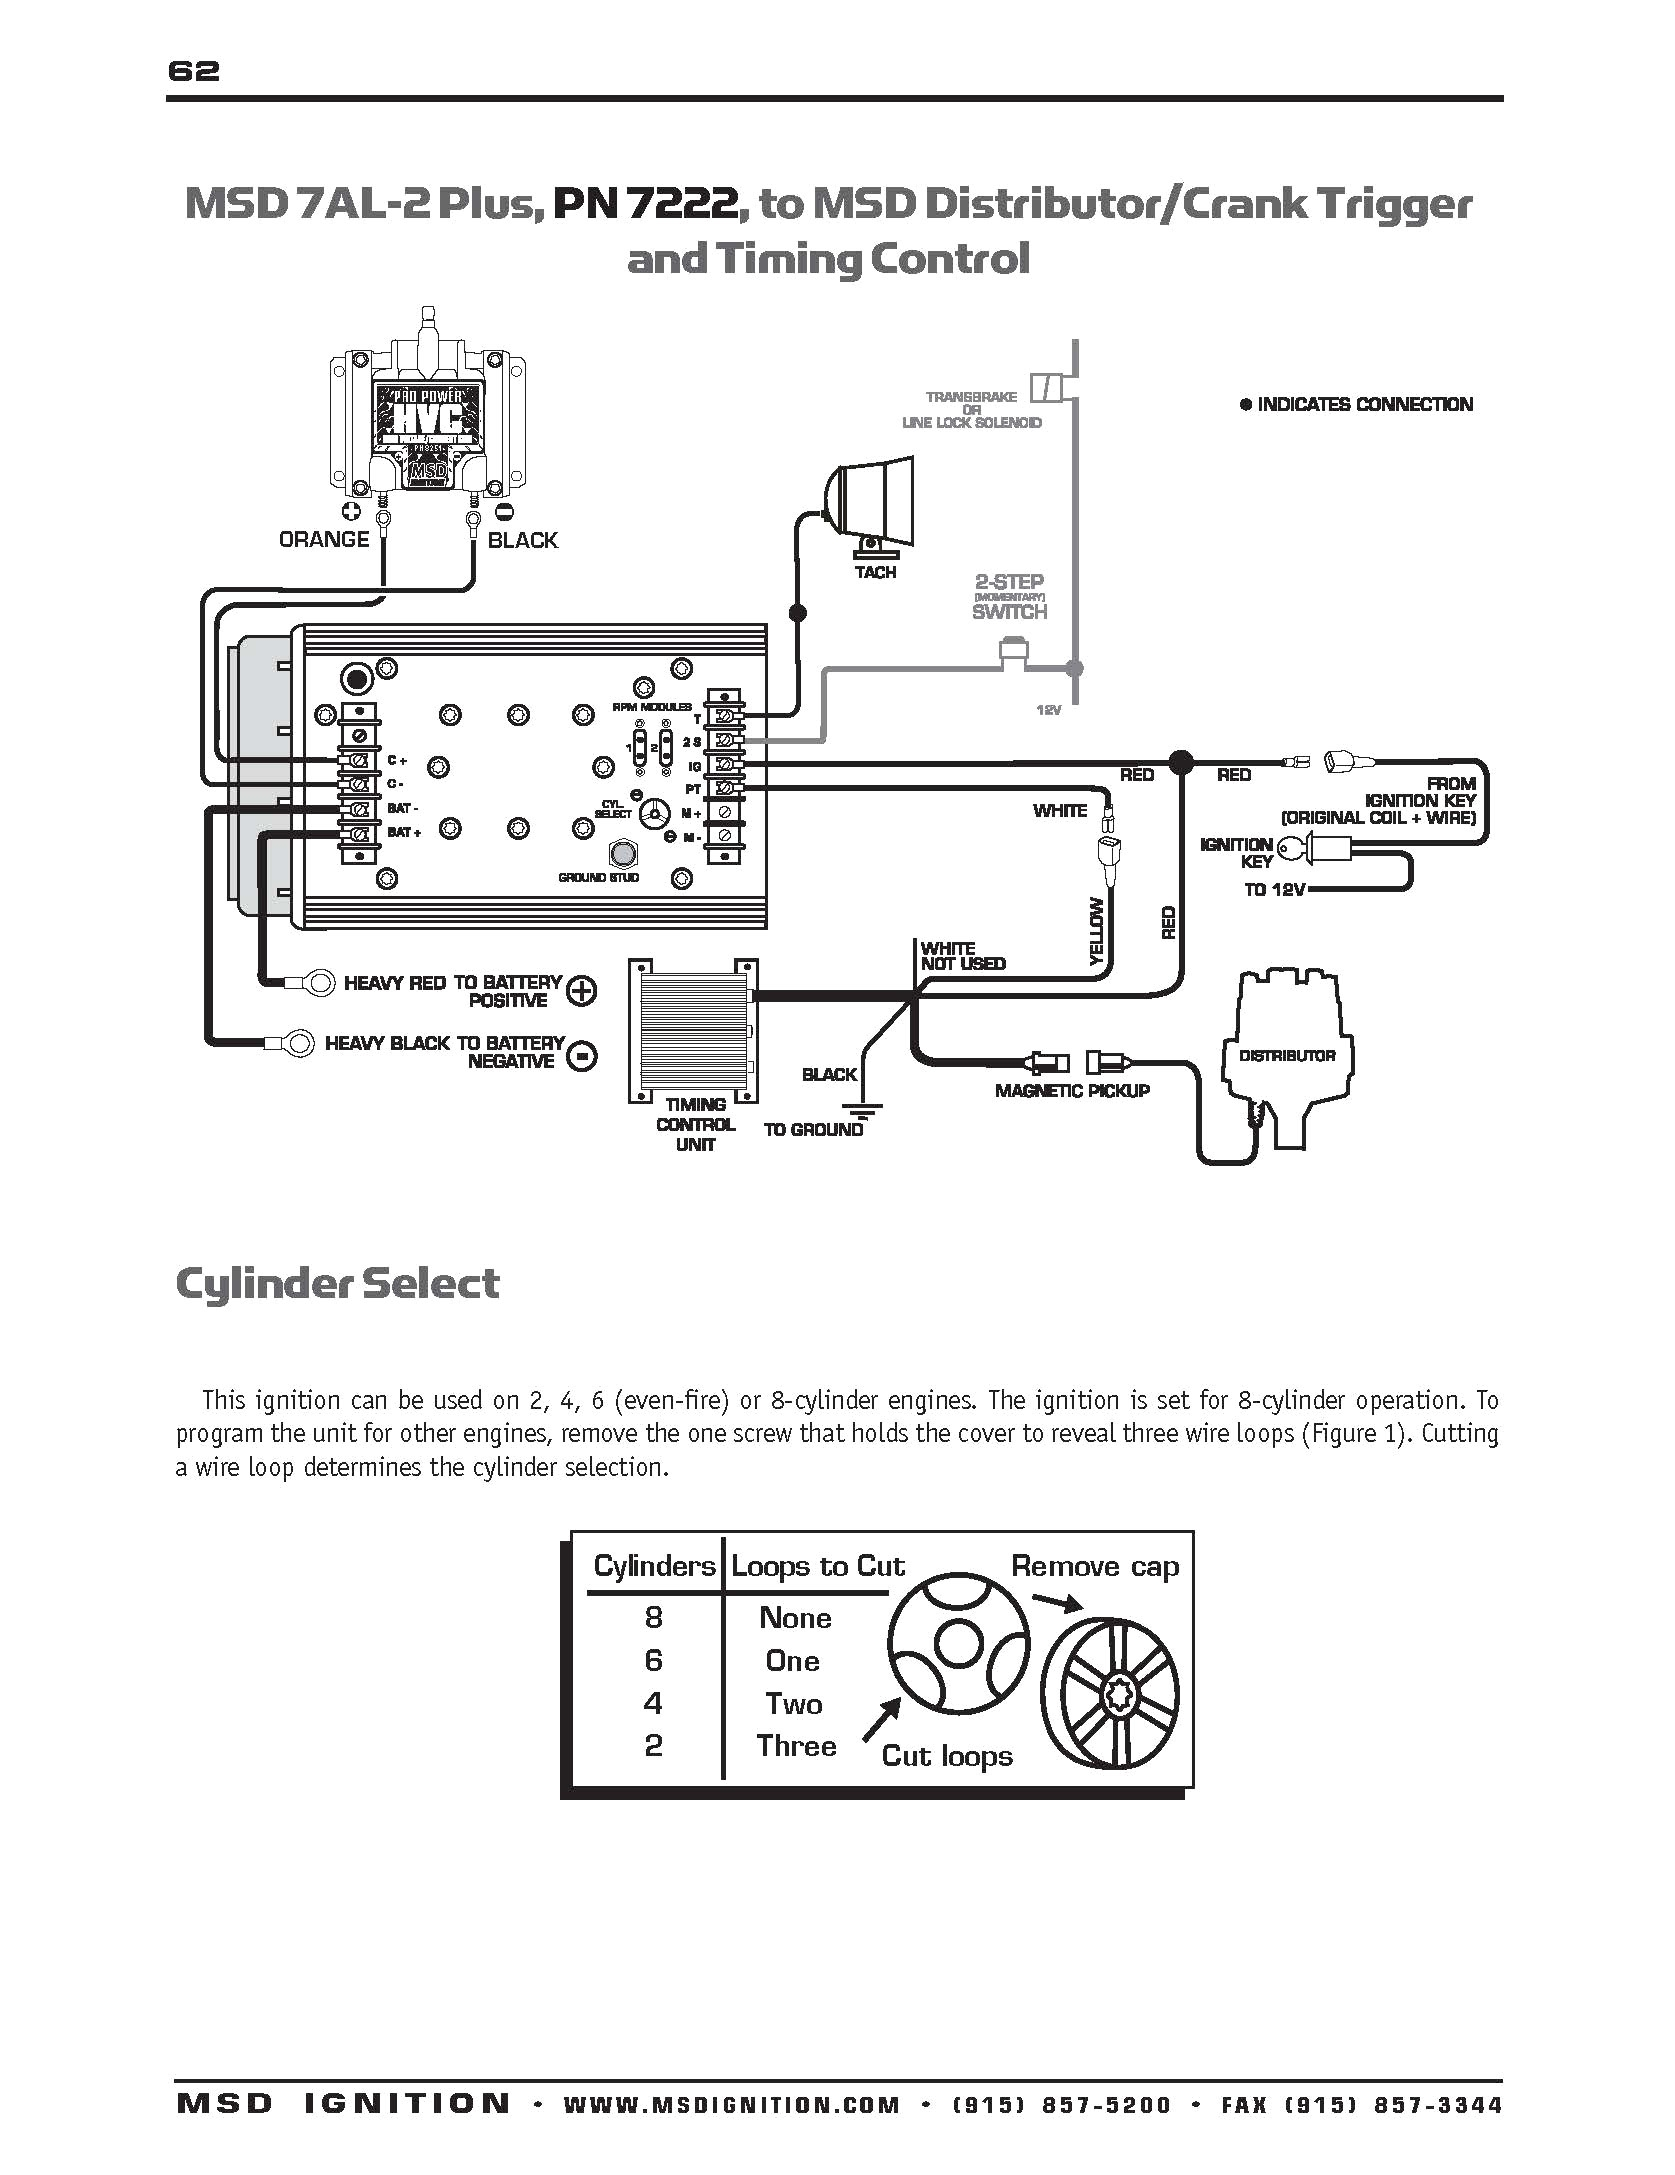 msd tach adapter wiring diagram mopar 7al 2 wiring diagram dat wiring diagrams  7al 2 wiring diagram dat wiring diagrams